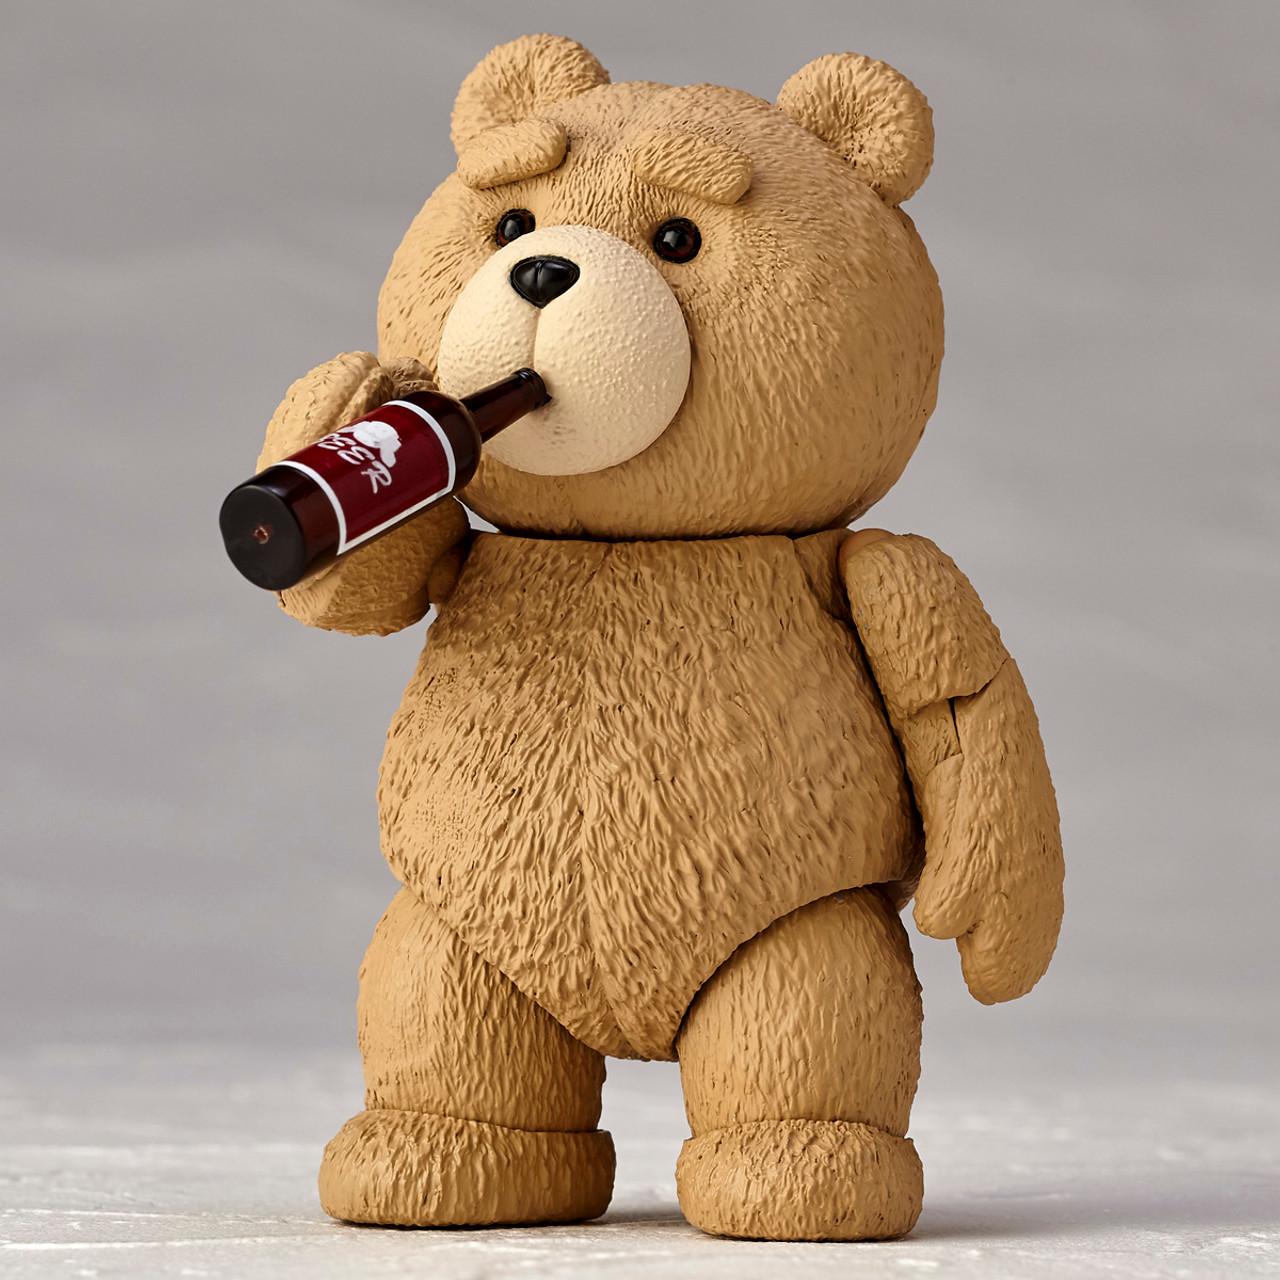 Teddy Bear TED 2 Movie Revoltech Series No.006 Kaiyodo PVC Figure Toys With Box